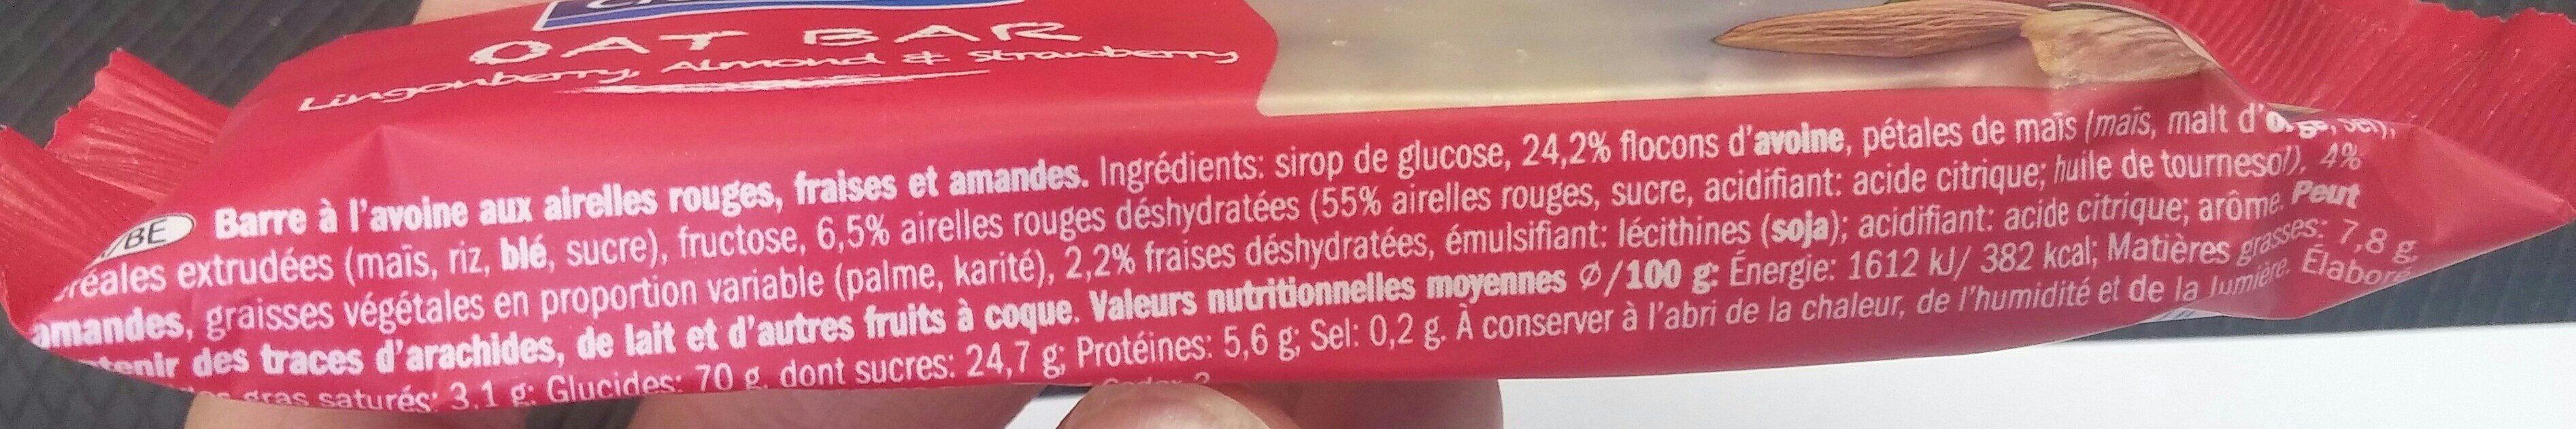 Oat bar - Ingrediënten - fr